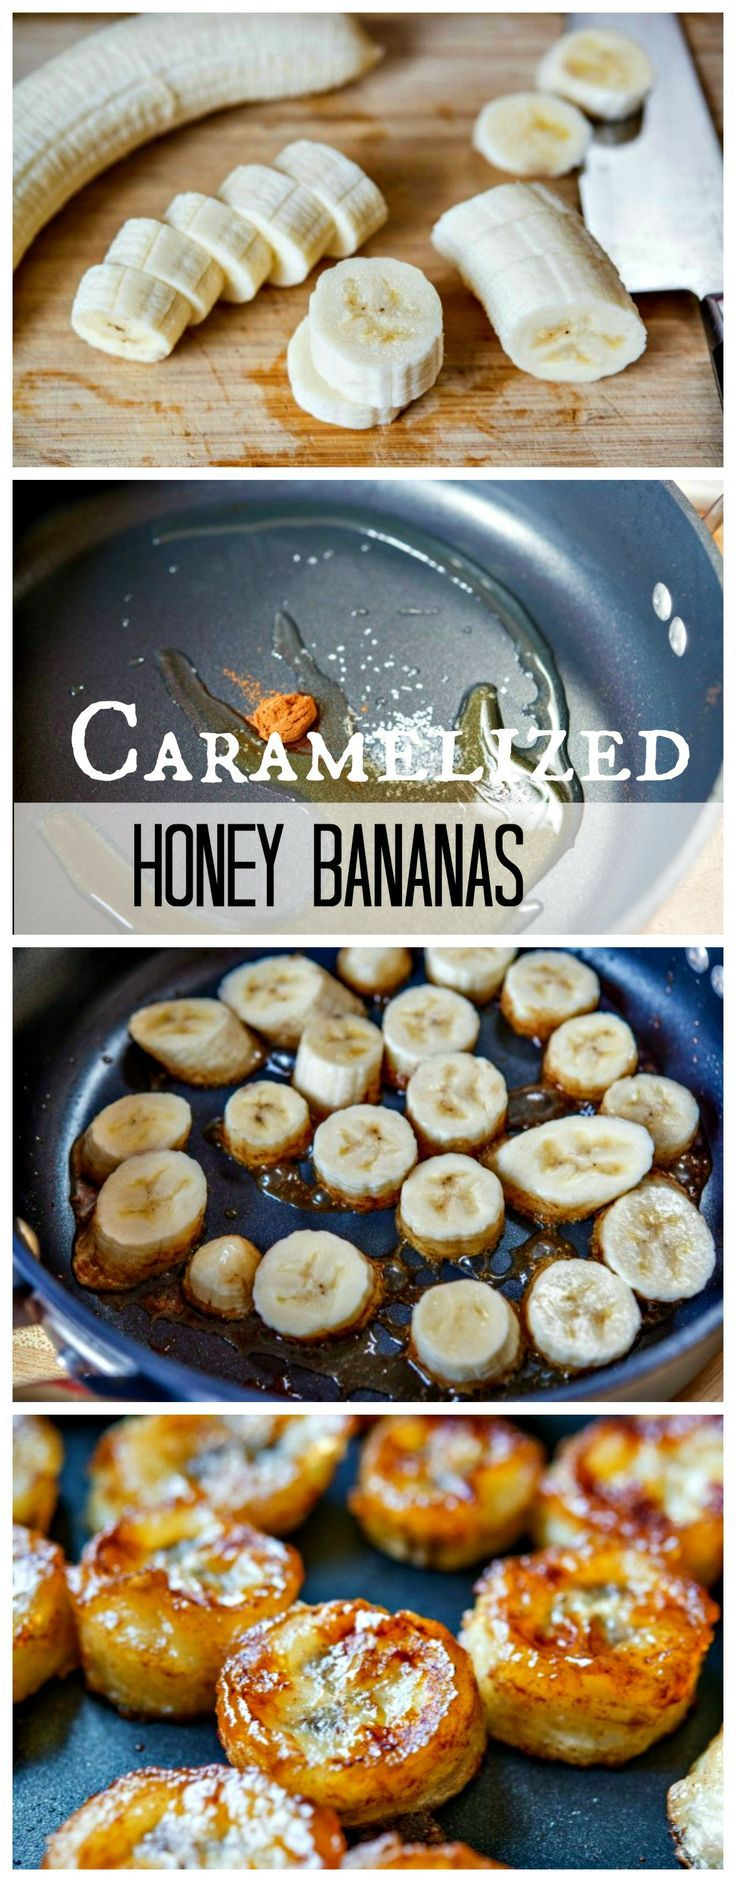 Caramelized Honey Bananas.